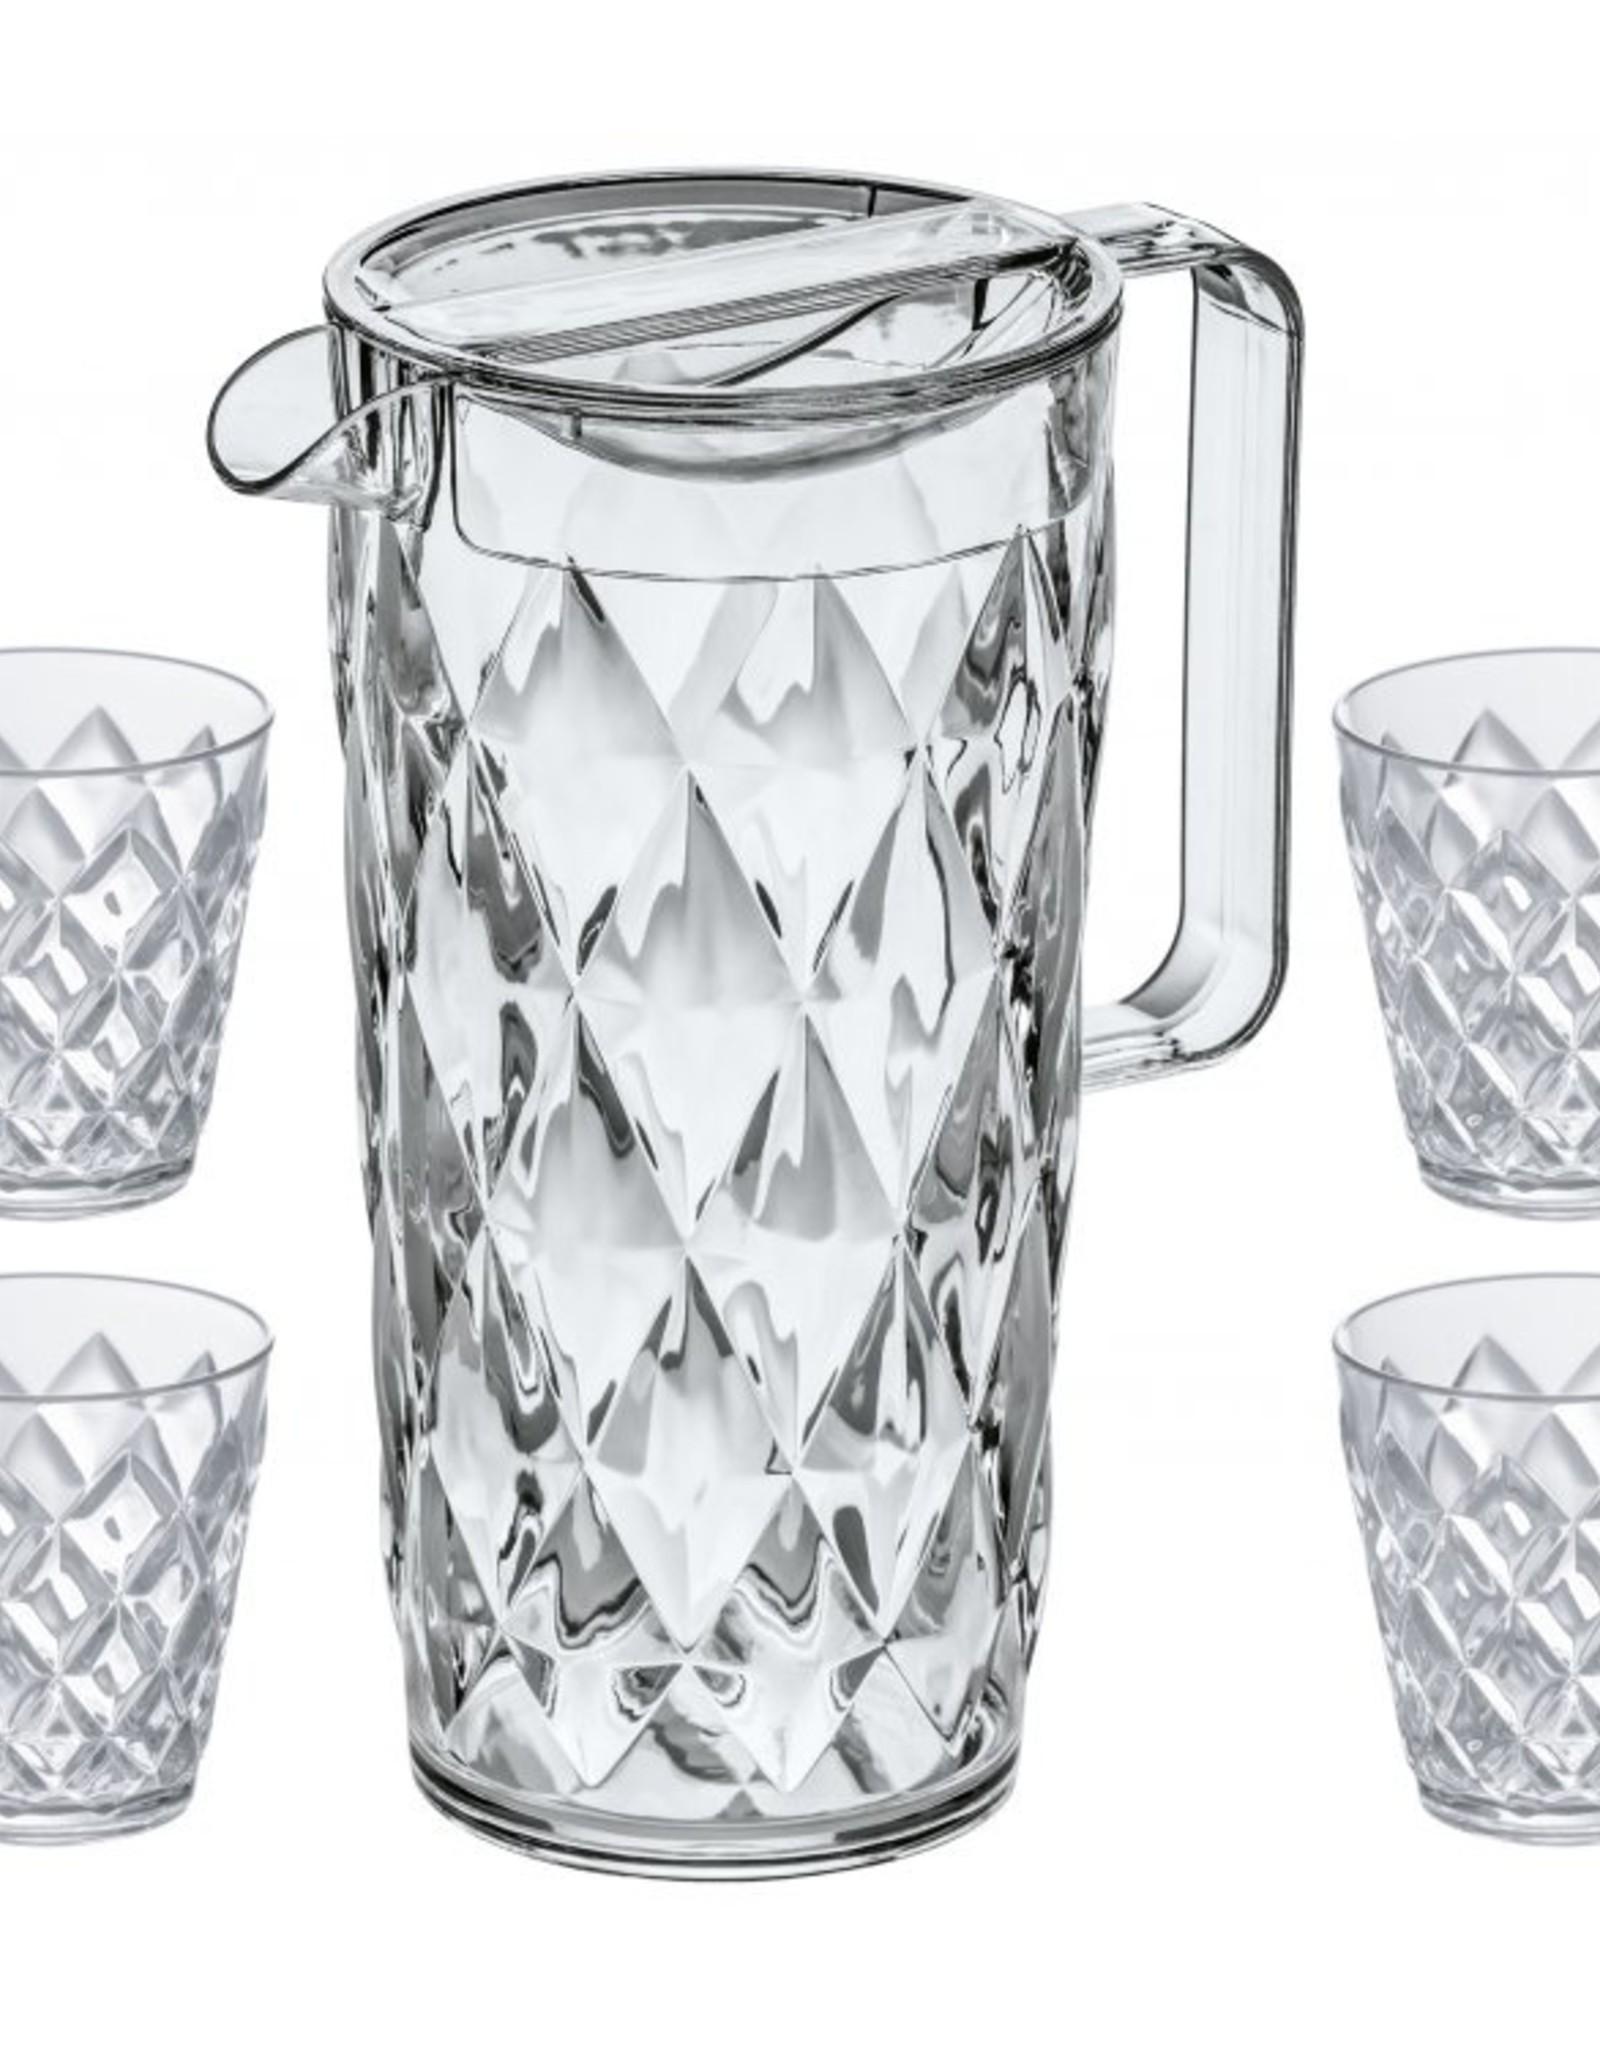 Koziol Koziol Crystal Karaf - 1,6 L - transparant helder - set met 4 glazen